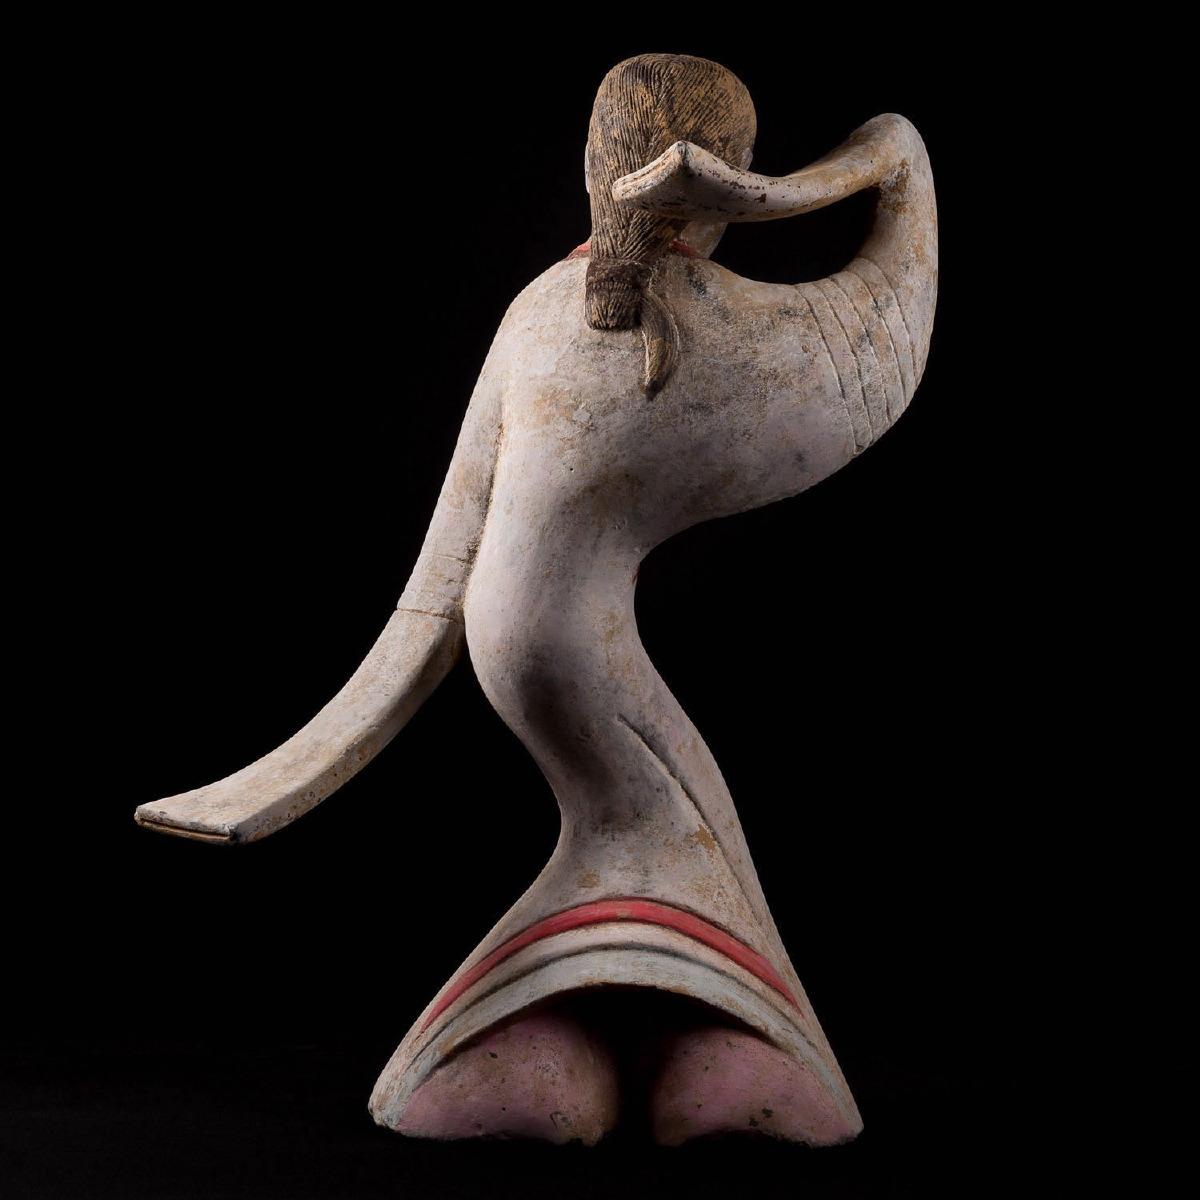 Photo of china-dancer-han-pottery-thermoluminescent-test-musuemgalerie-golconda